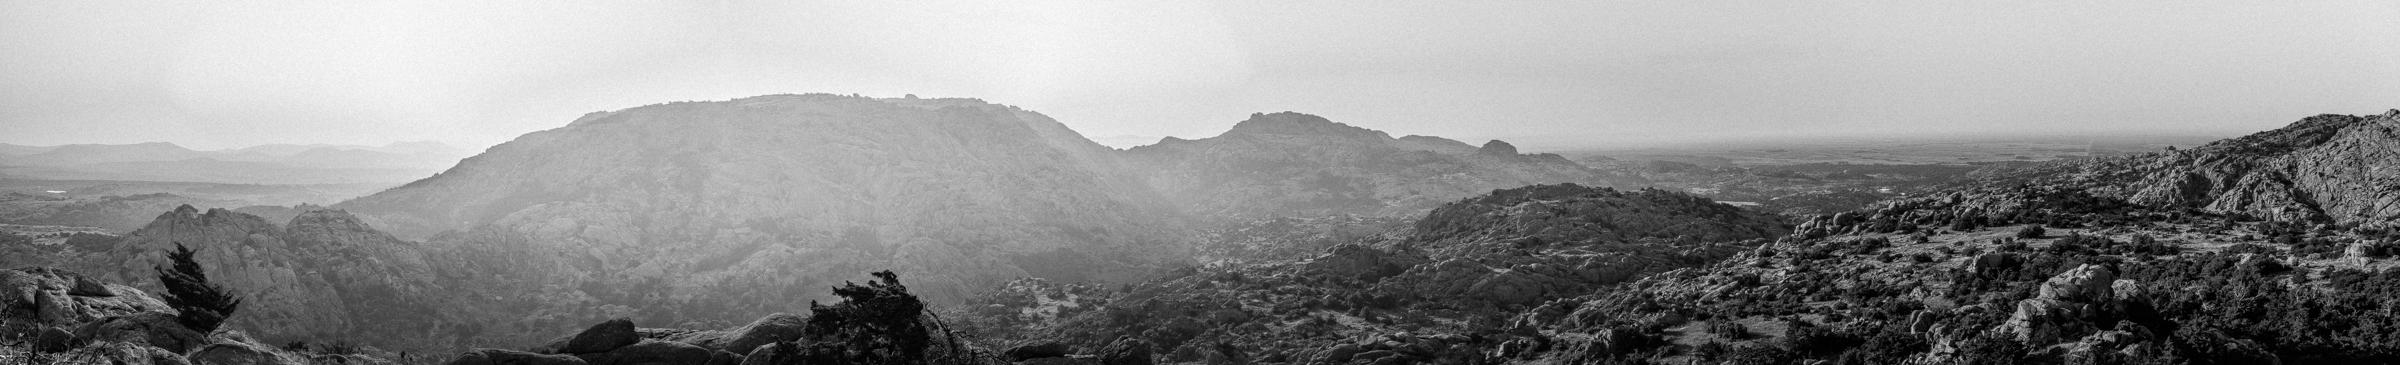 2017-08-05 Glass Mountain Peak B (5 of 20).jpg